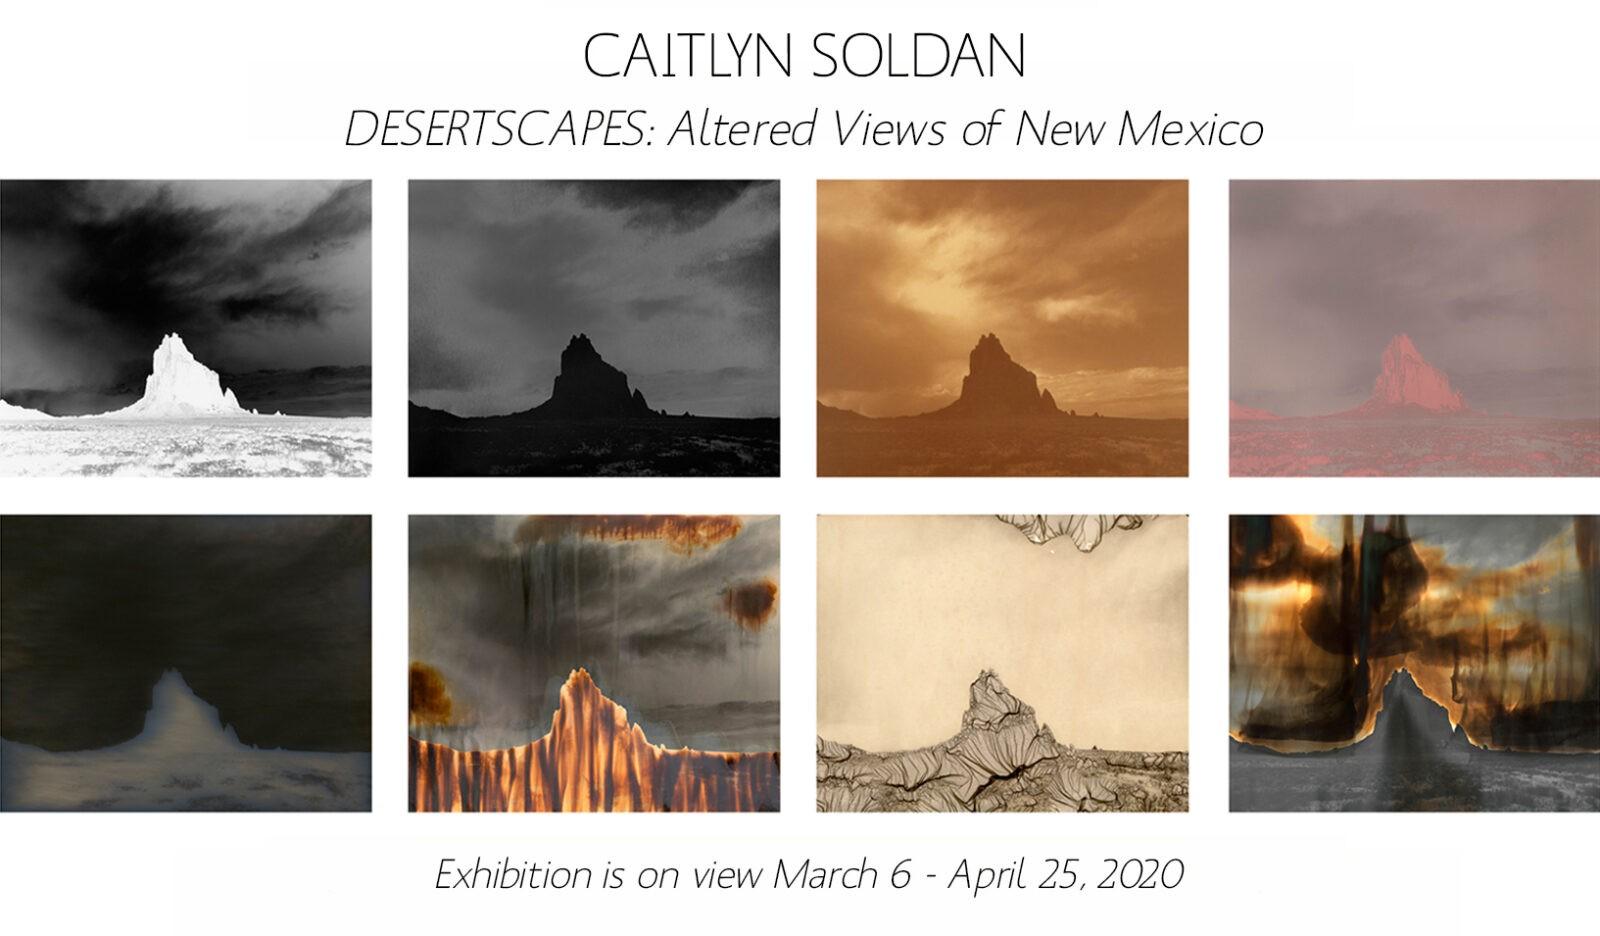 image of postcard for Caitlyn Soldan's exhibition, Desertscapes